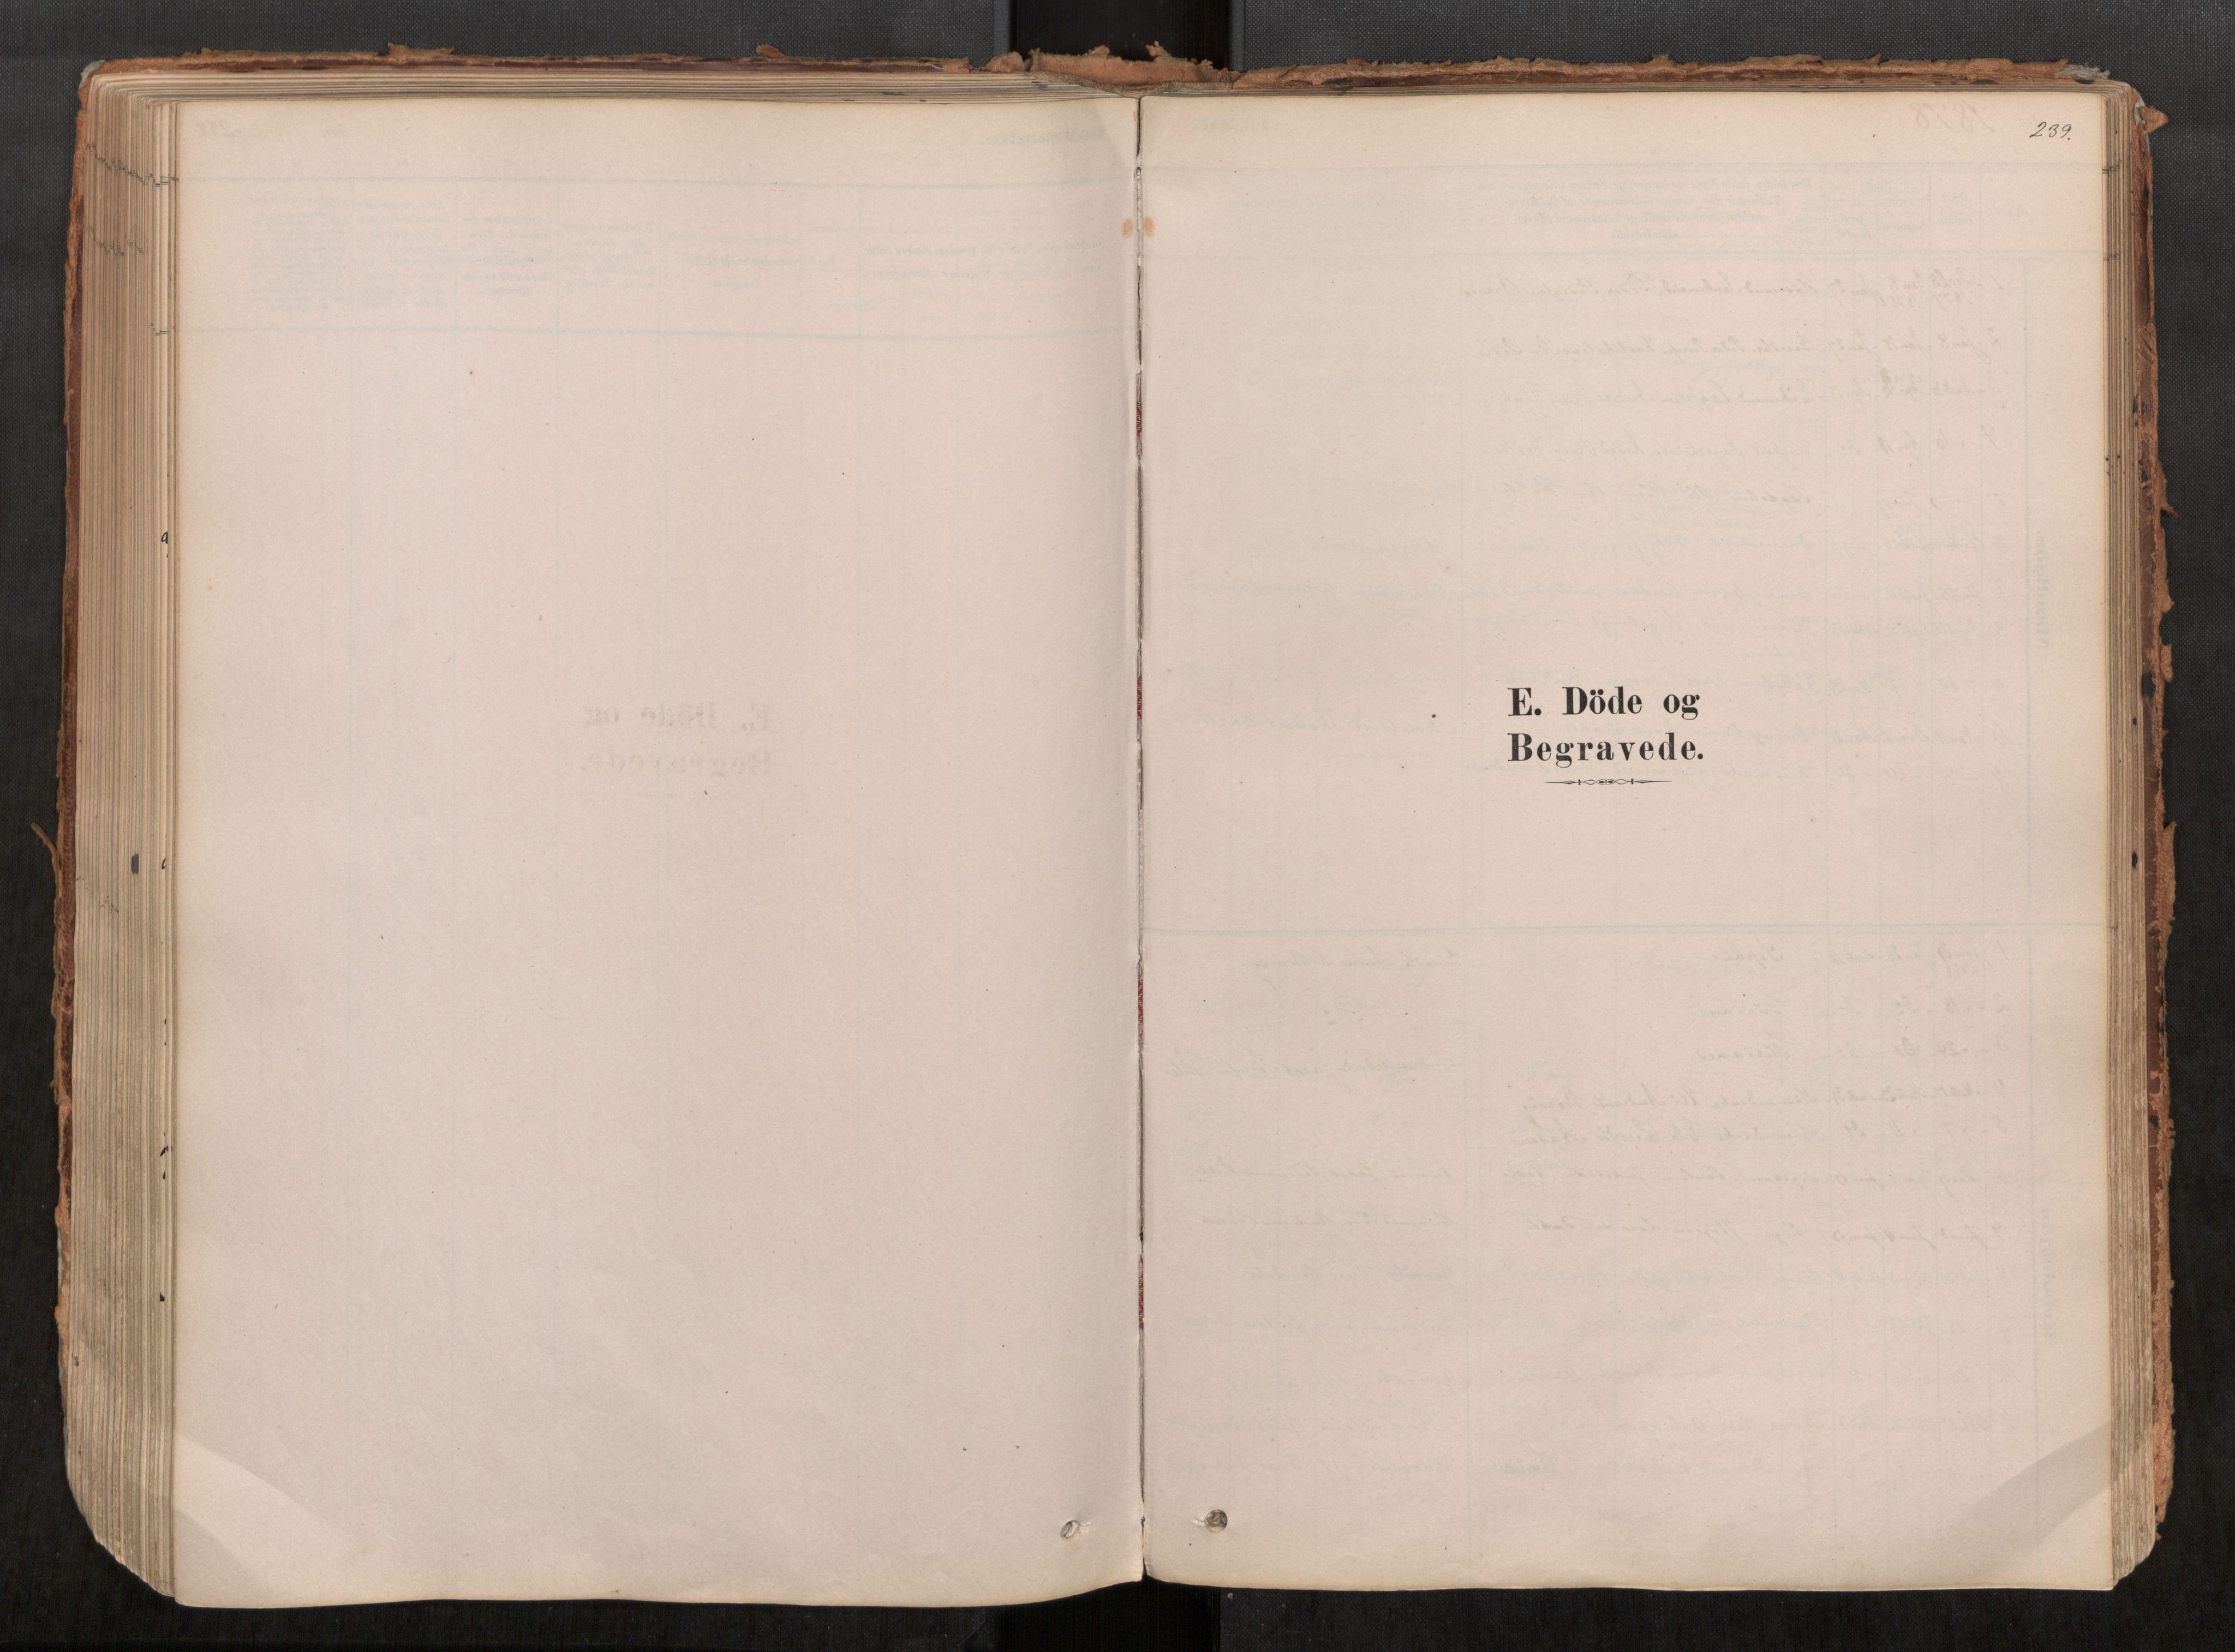 SAT, Grytten sokneprestkontor, Ministerialbok nr. 545A03, 1878-1920, s. 239